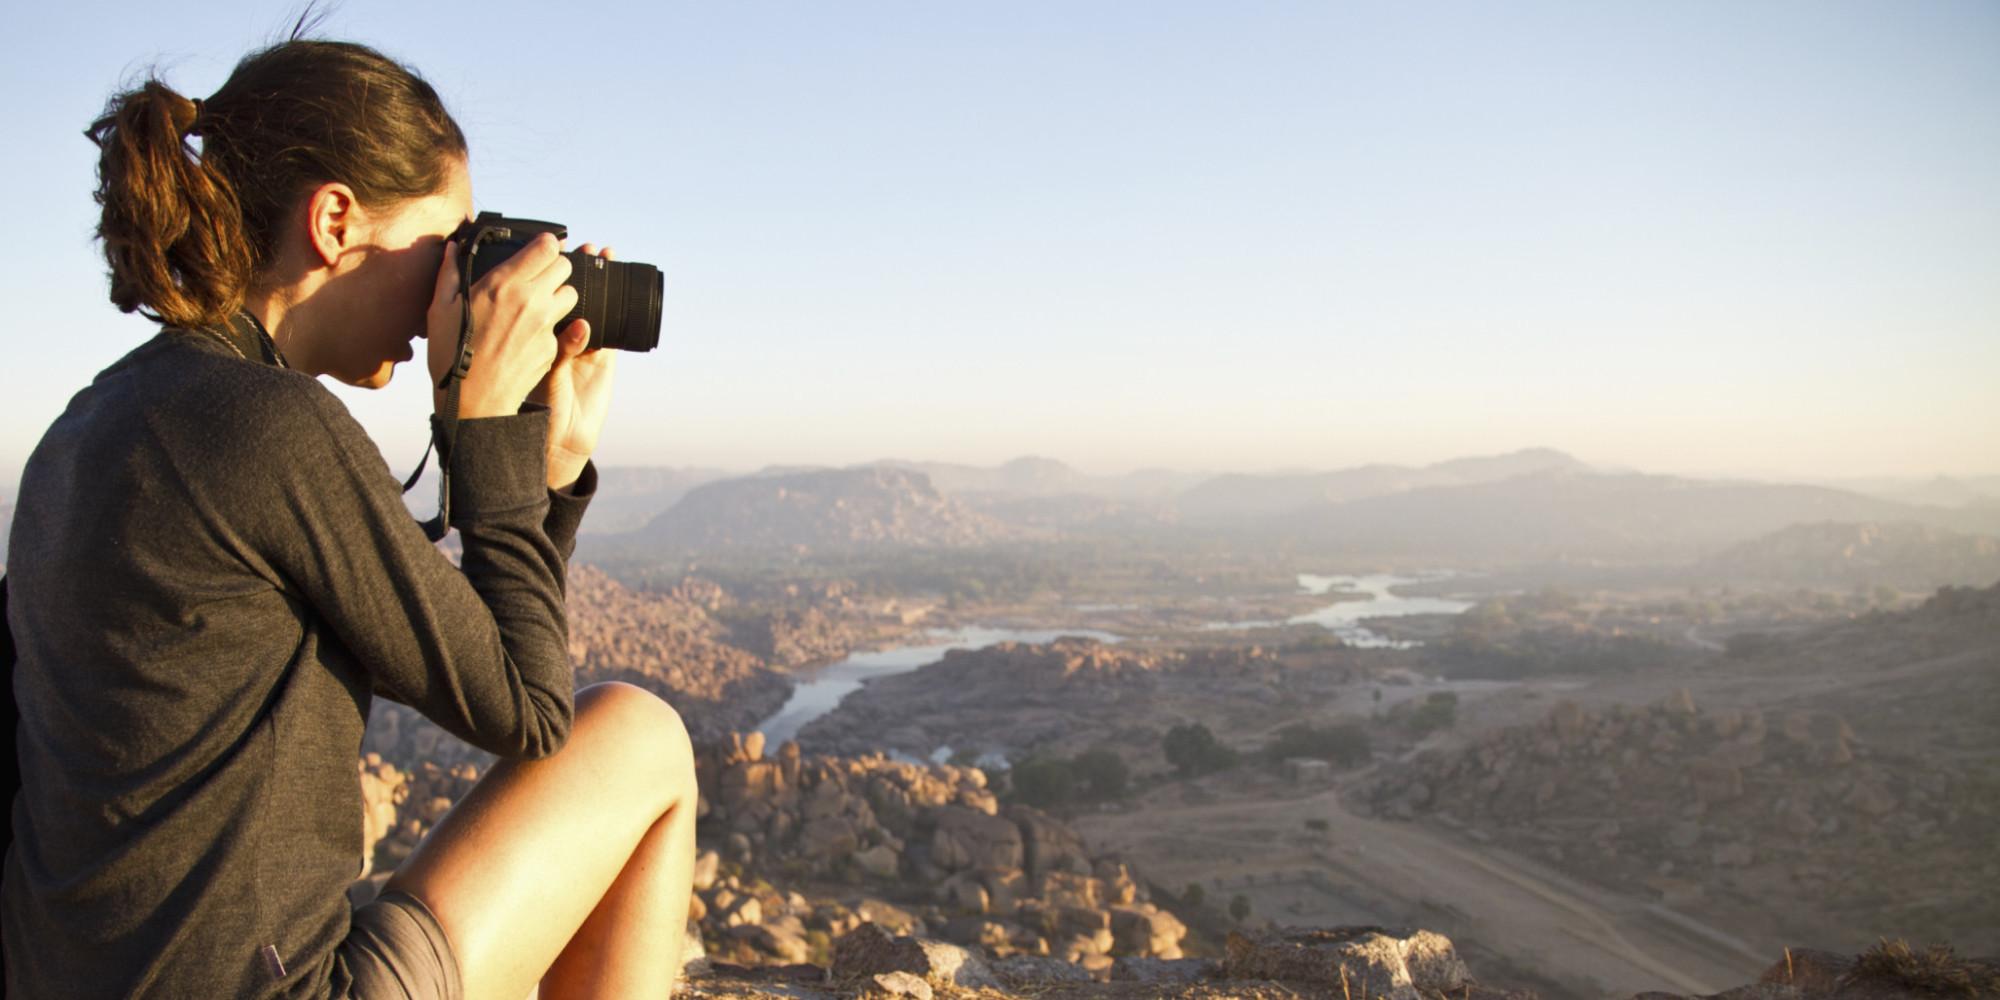 Single Woman Traveling The World